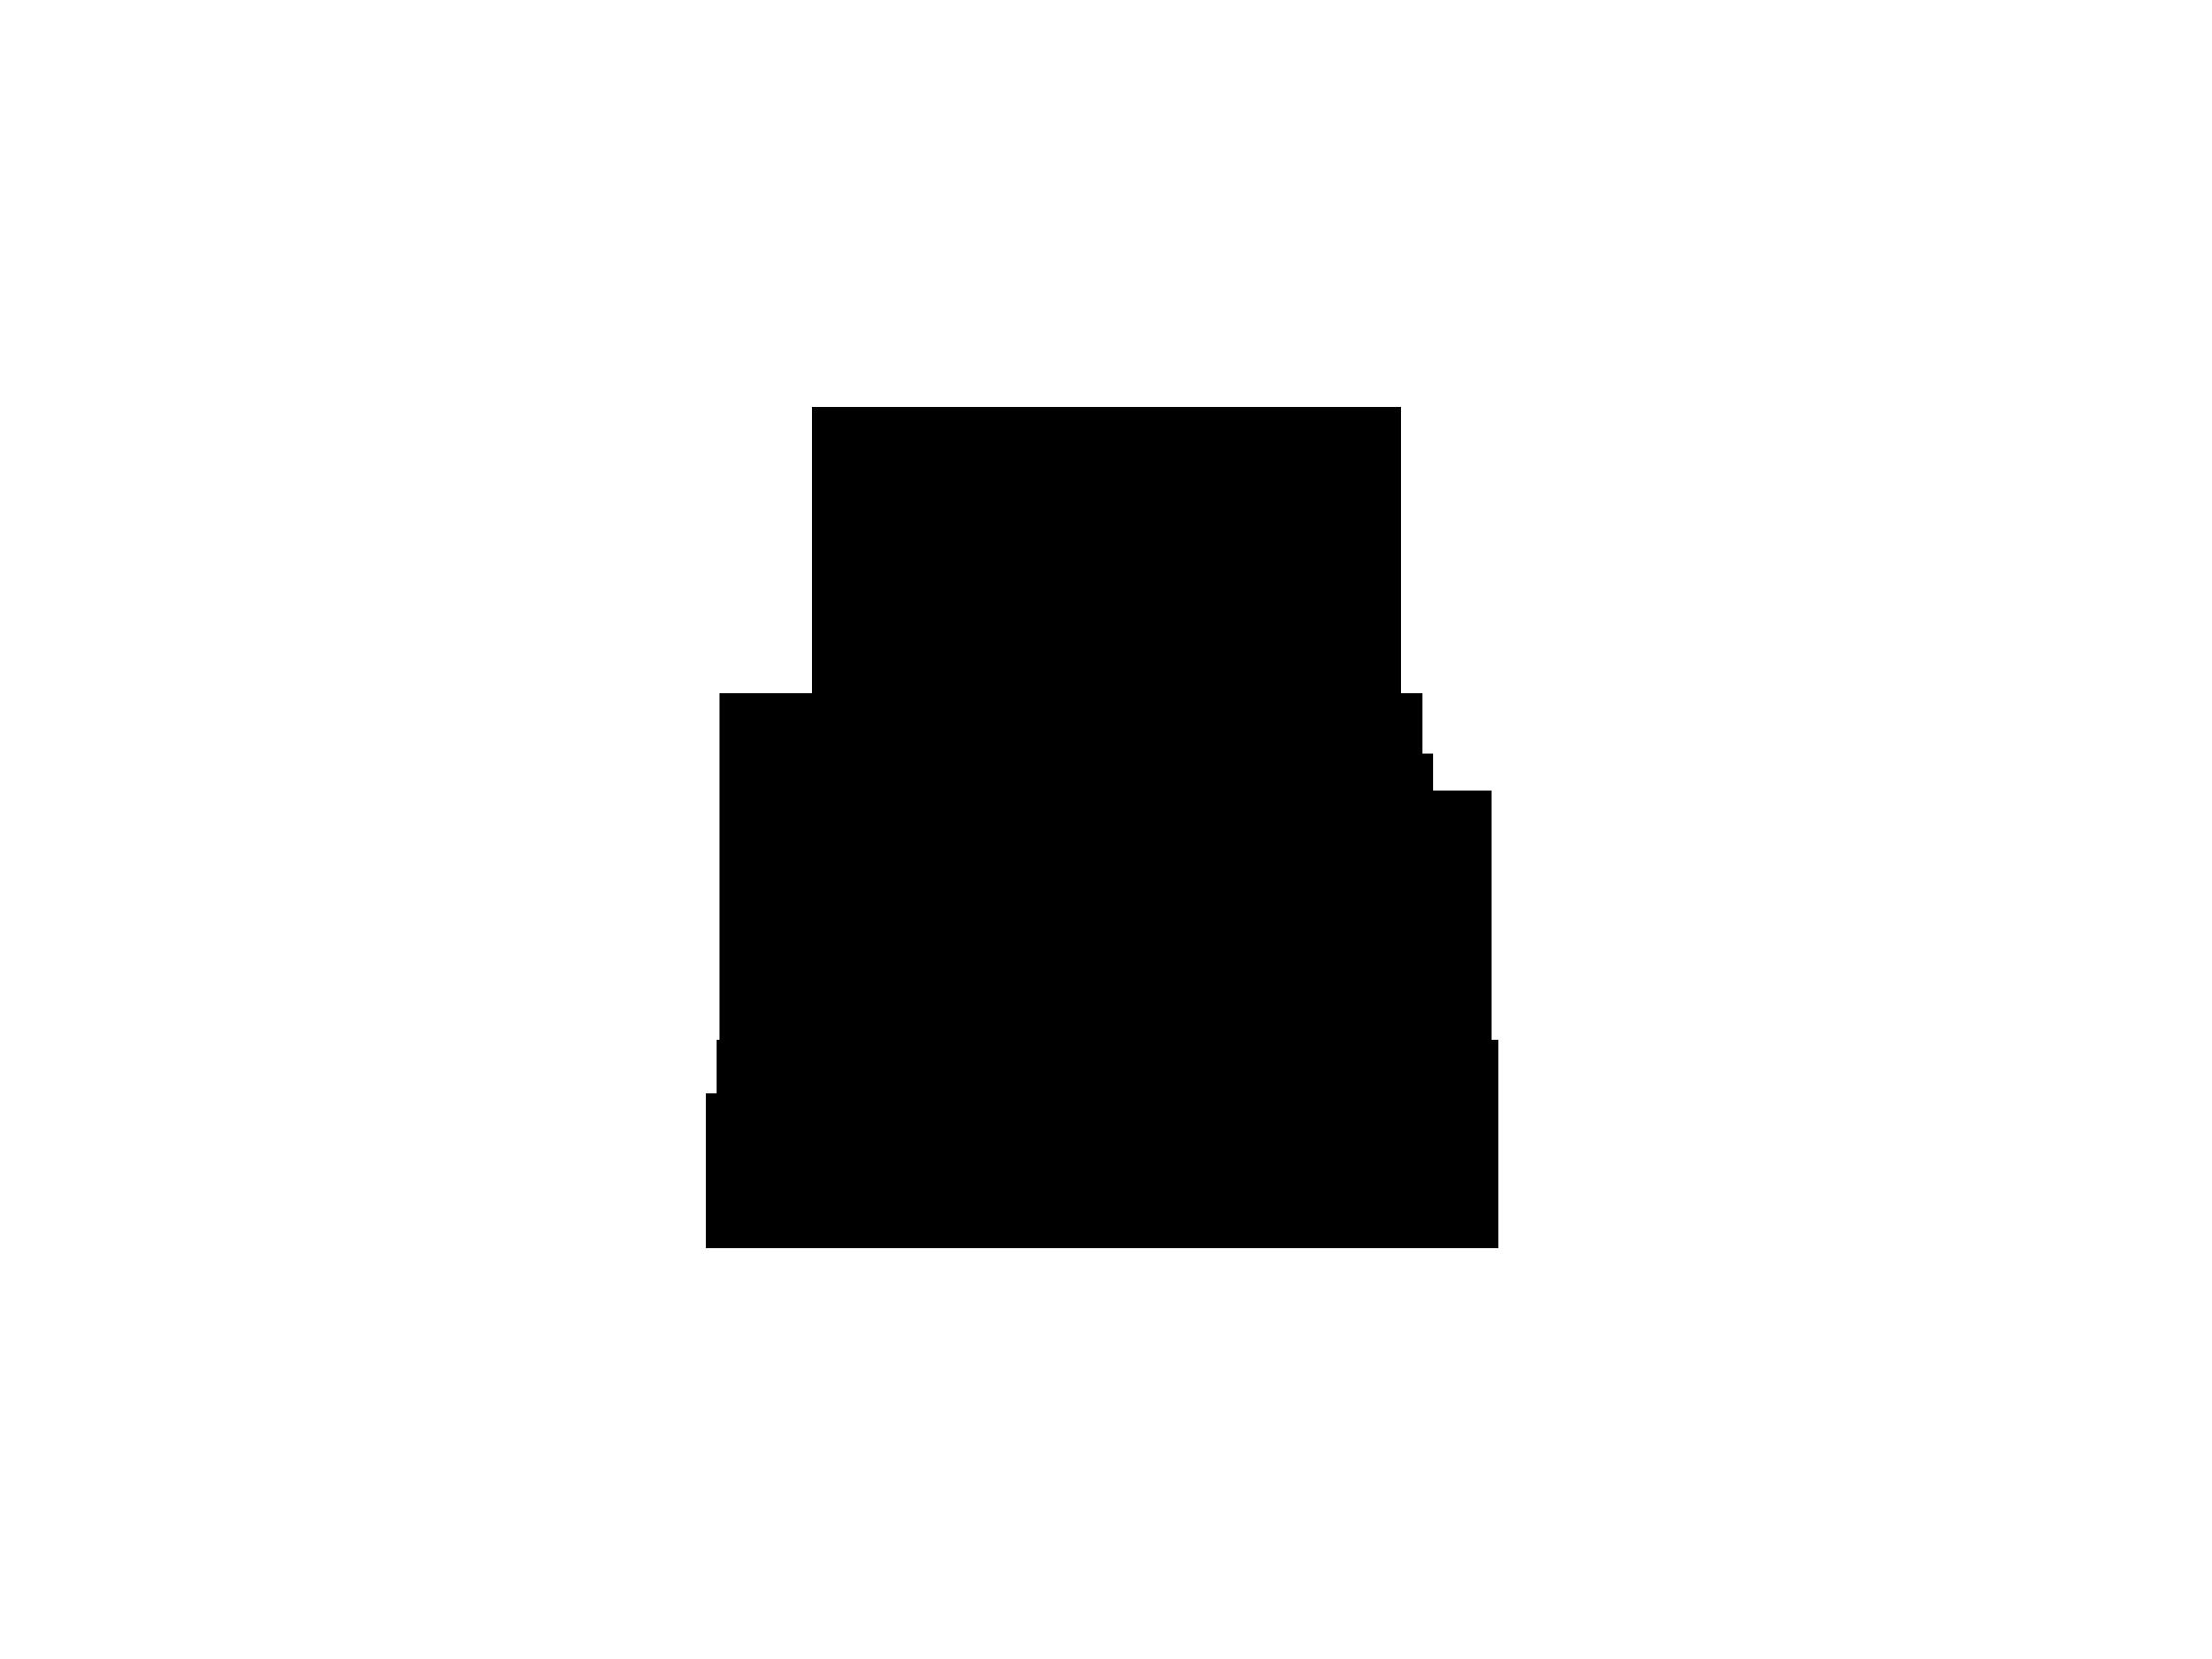 Major record label logos